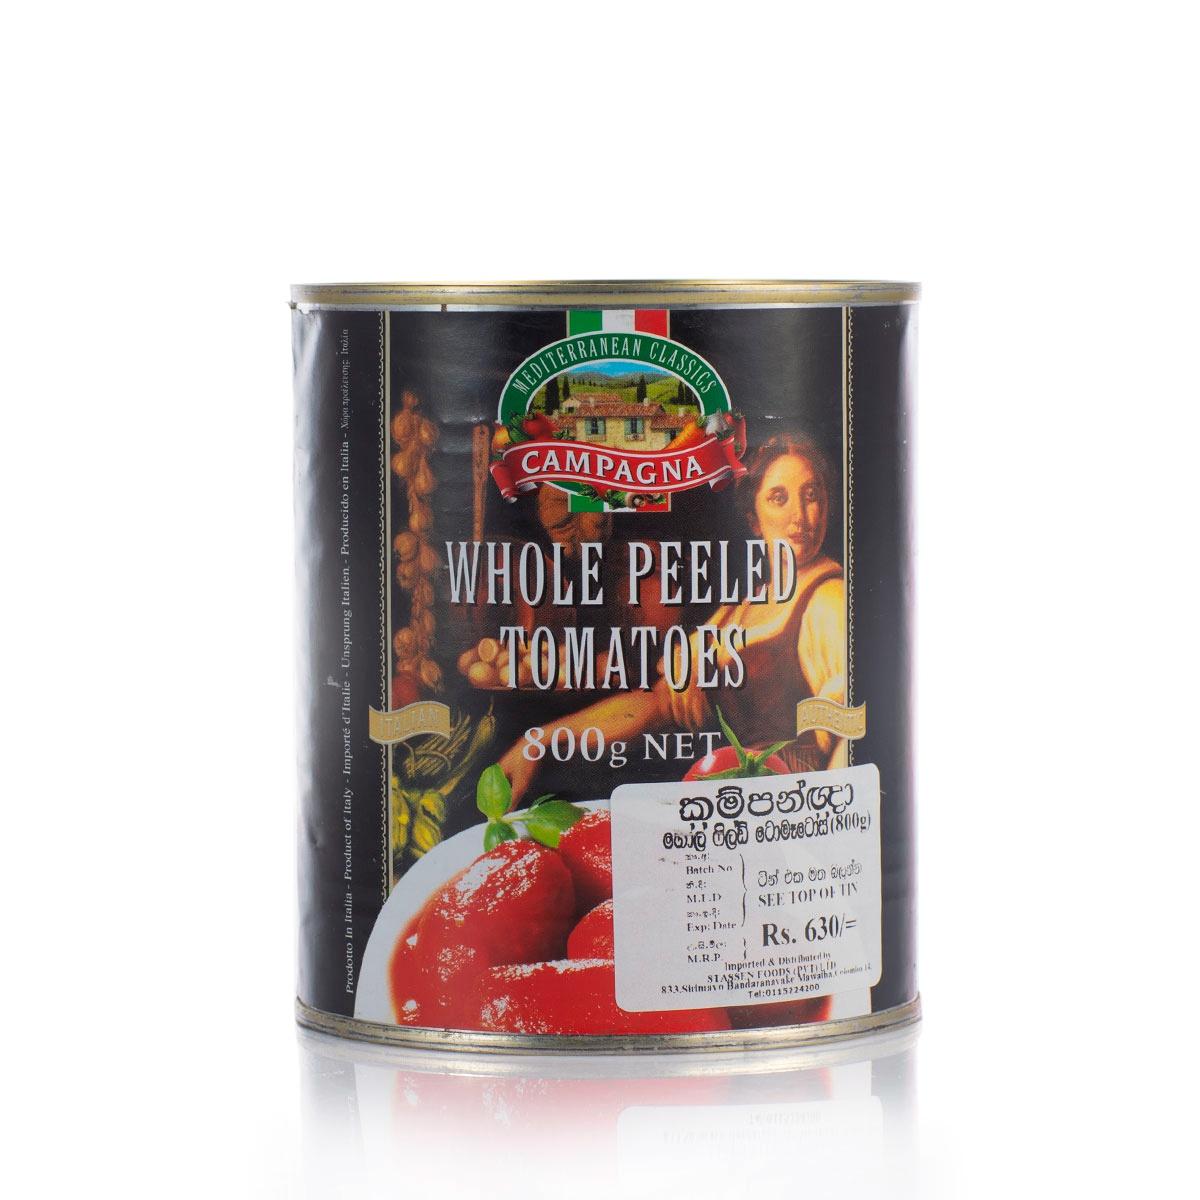 Campagna Whole Peeled Tomatoes 800G - in Sri Lanka